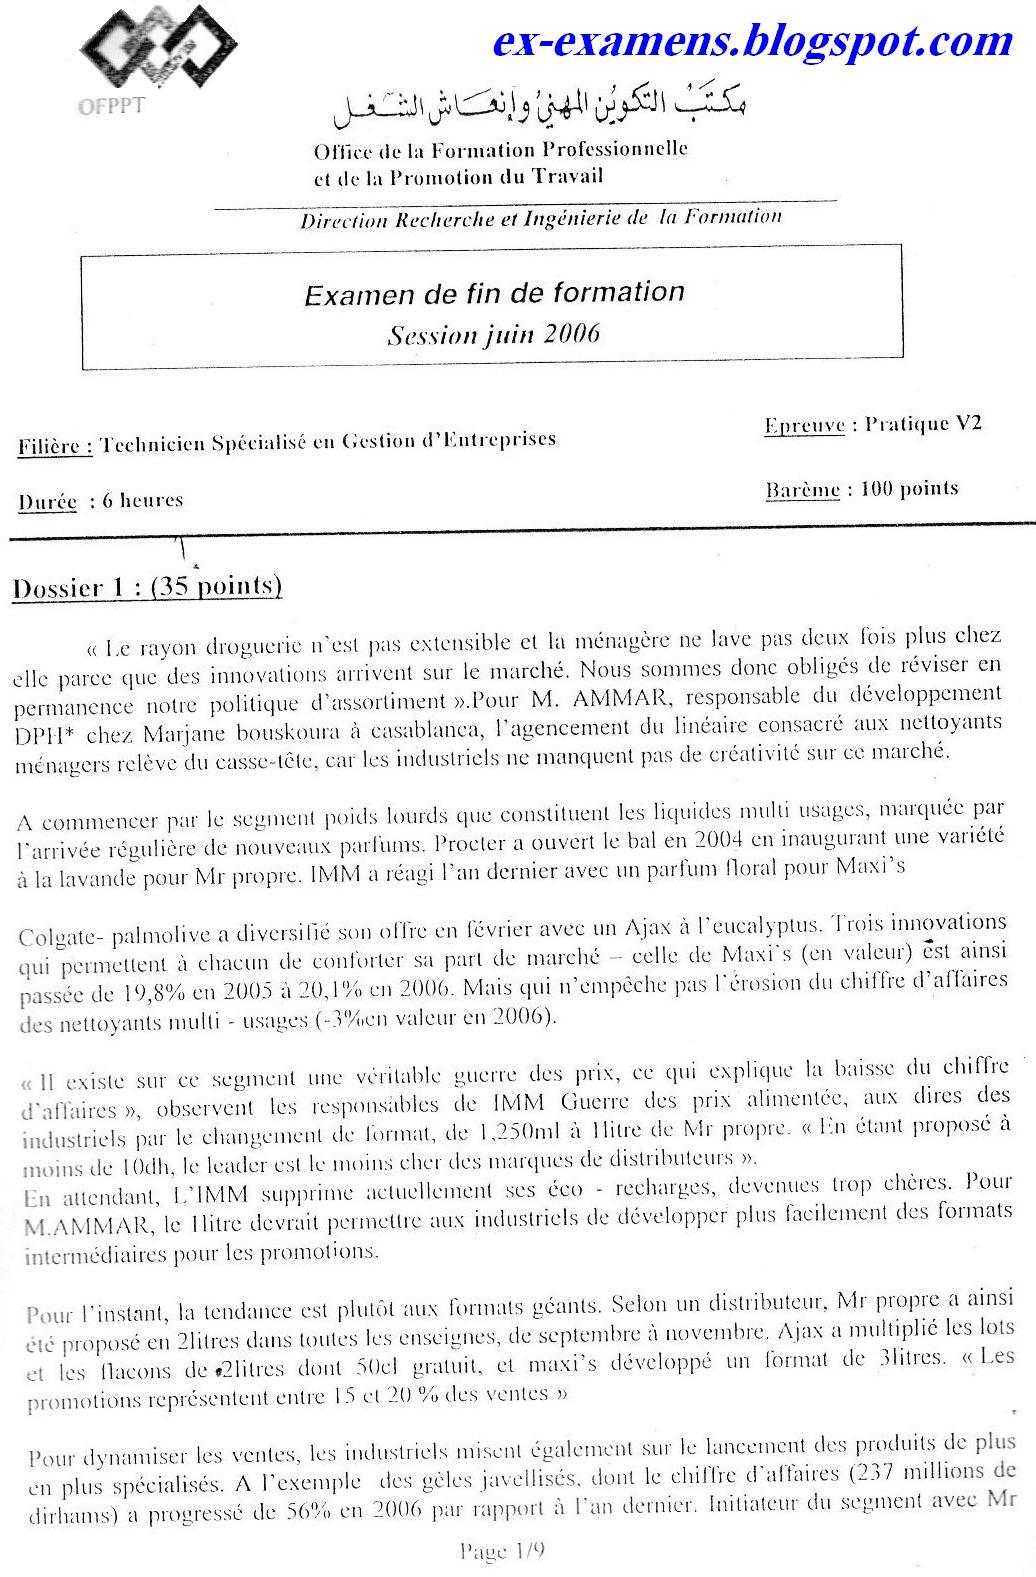 Examen de fin de formation pratique TSGE 2006 Variante 2 IMG_0120